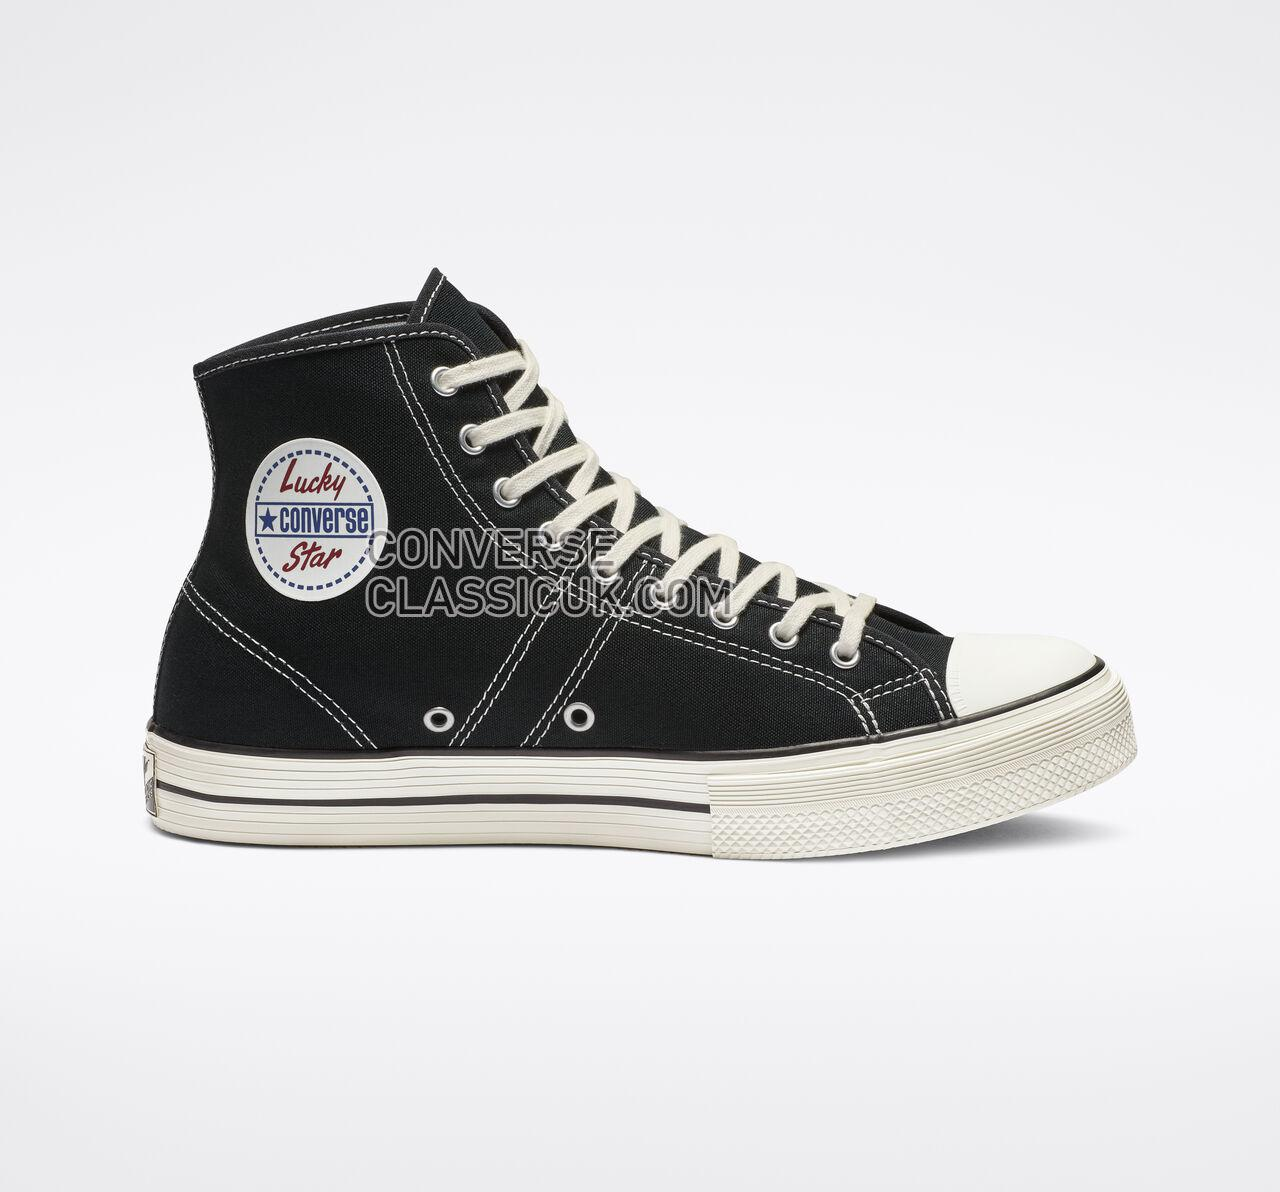 Converse Lucky Star High Top Mens Womens Unisex 163321C Black/Egret/Egret Shoes